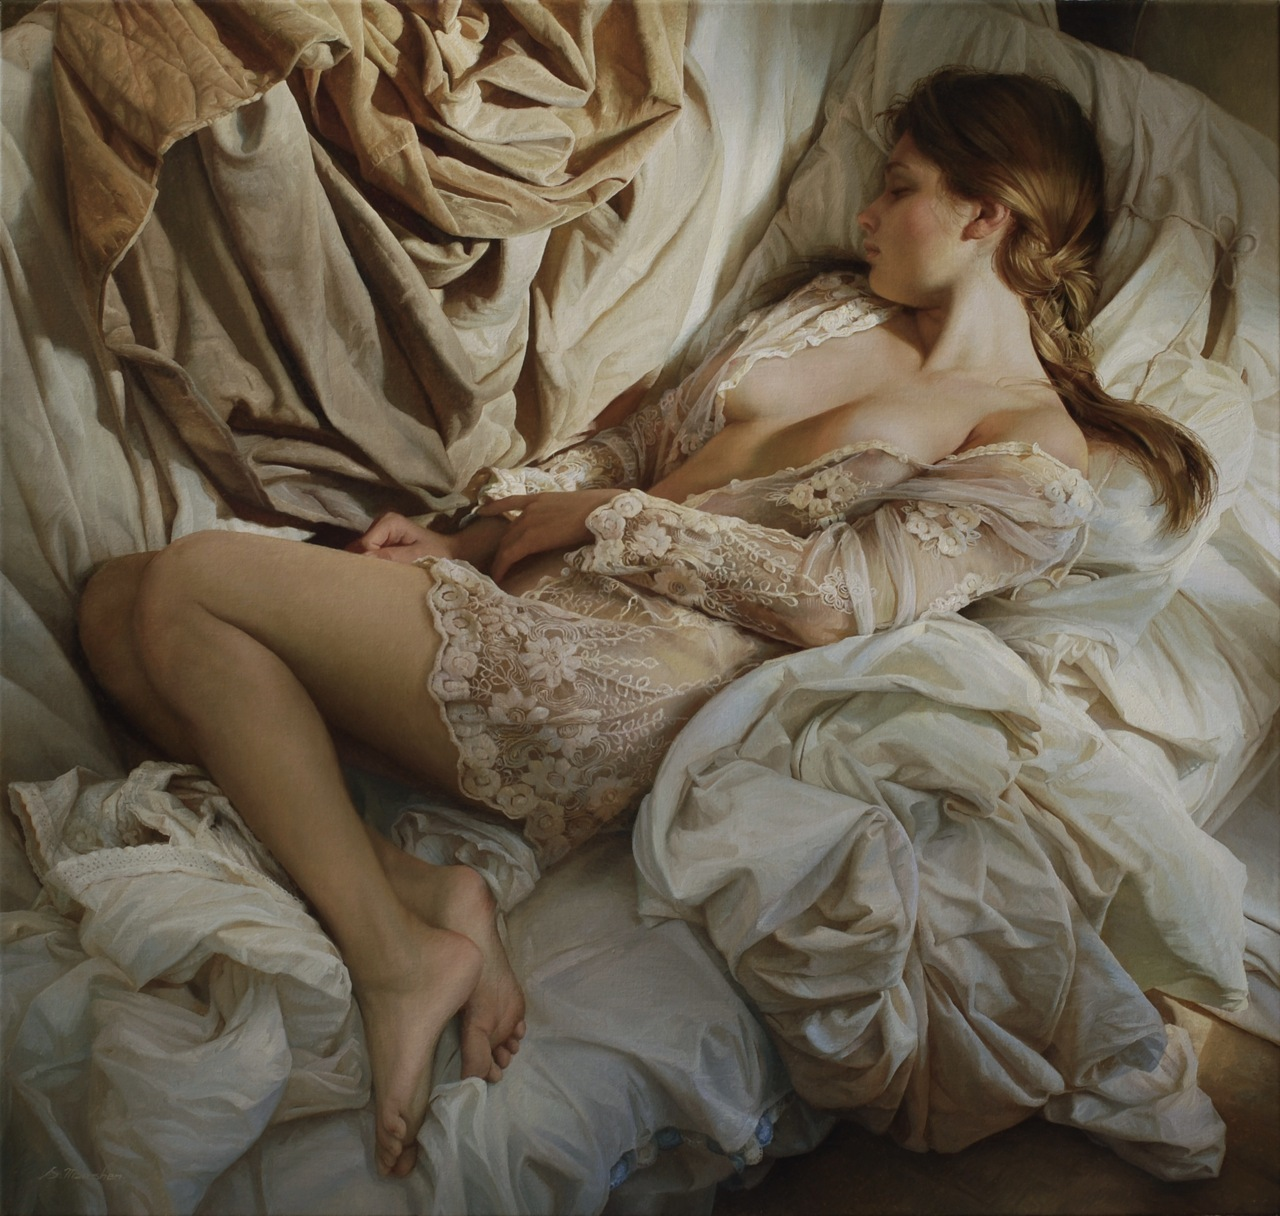 Serie: Los Pintores – 20 - Serguei Marxennikov